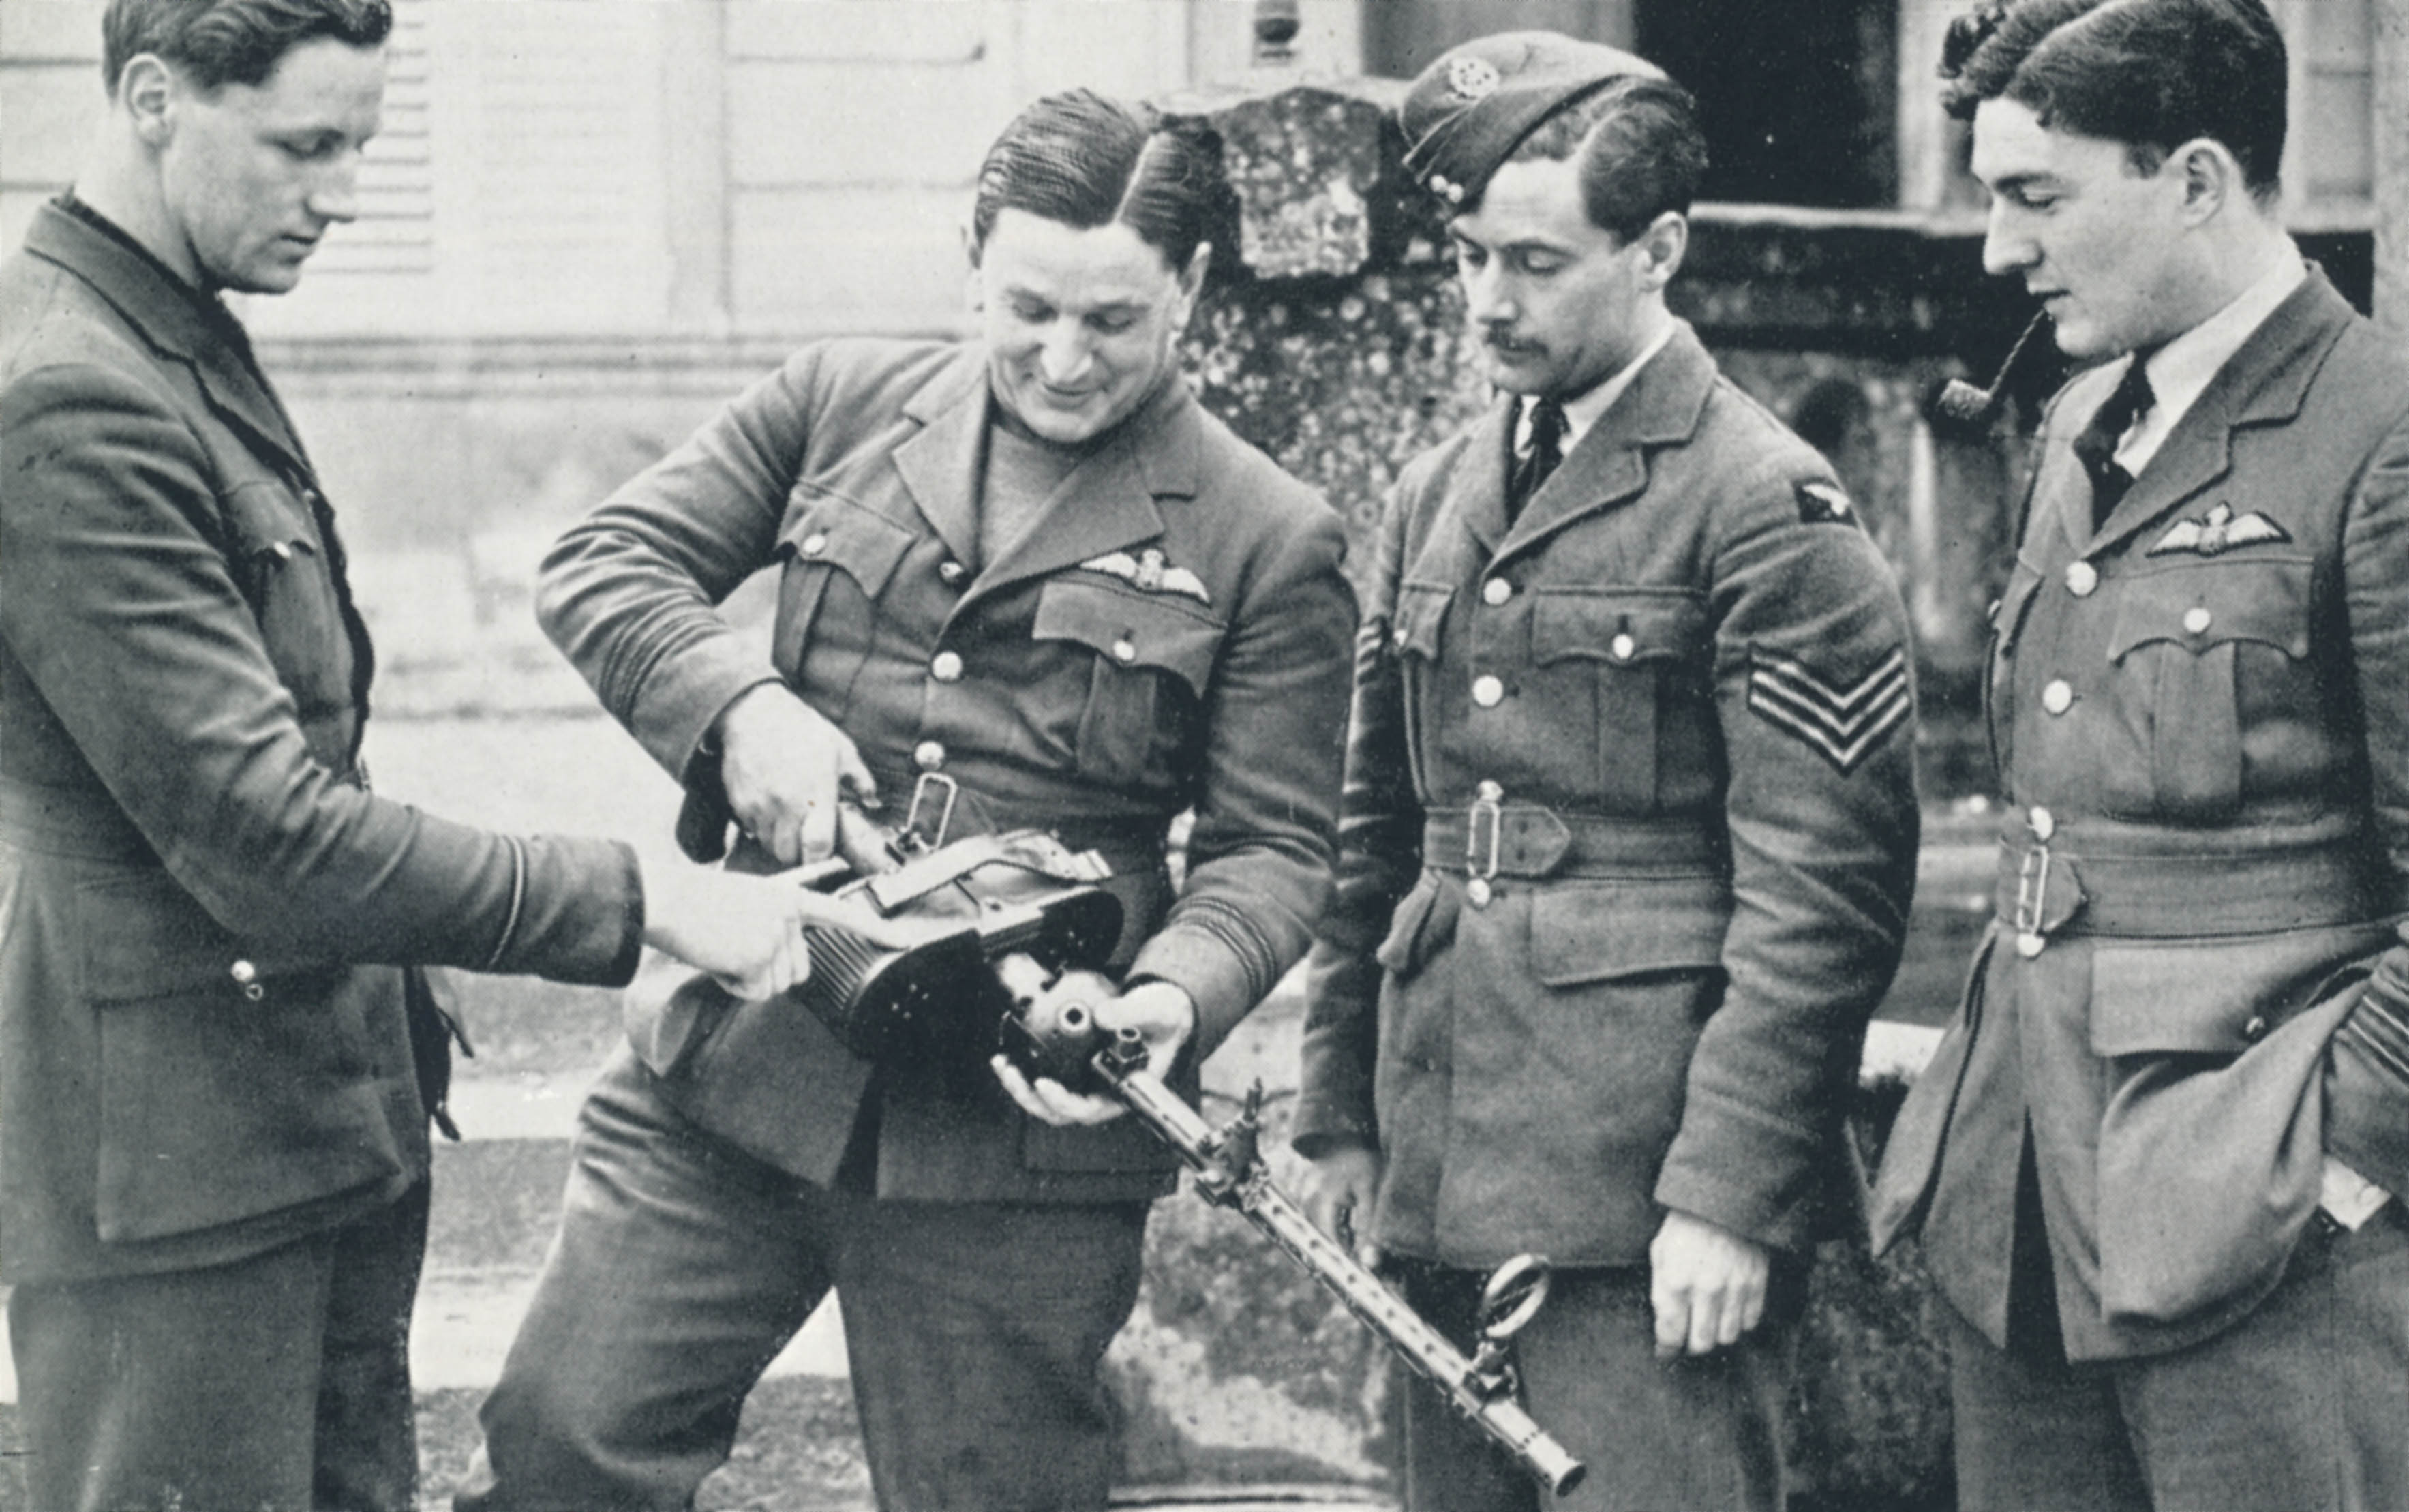 RAF_pilots_examine_captured_German_aerial_machine_gun.jpg